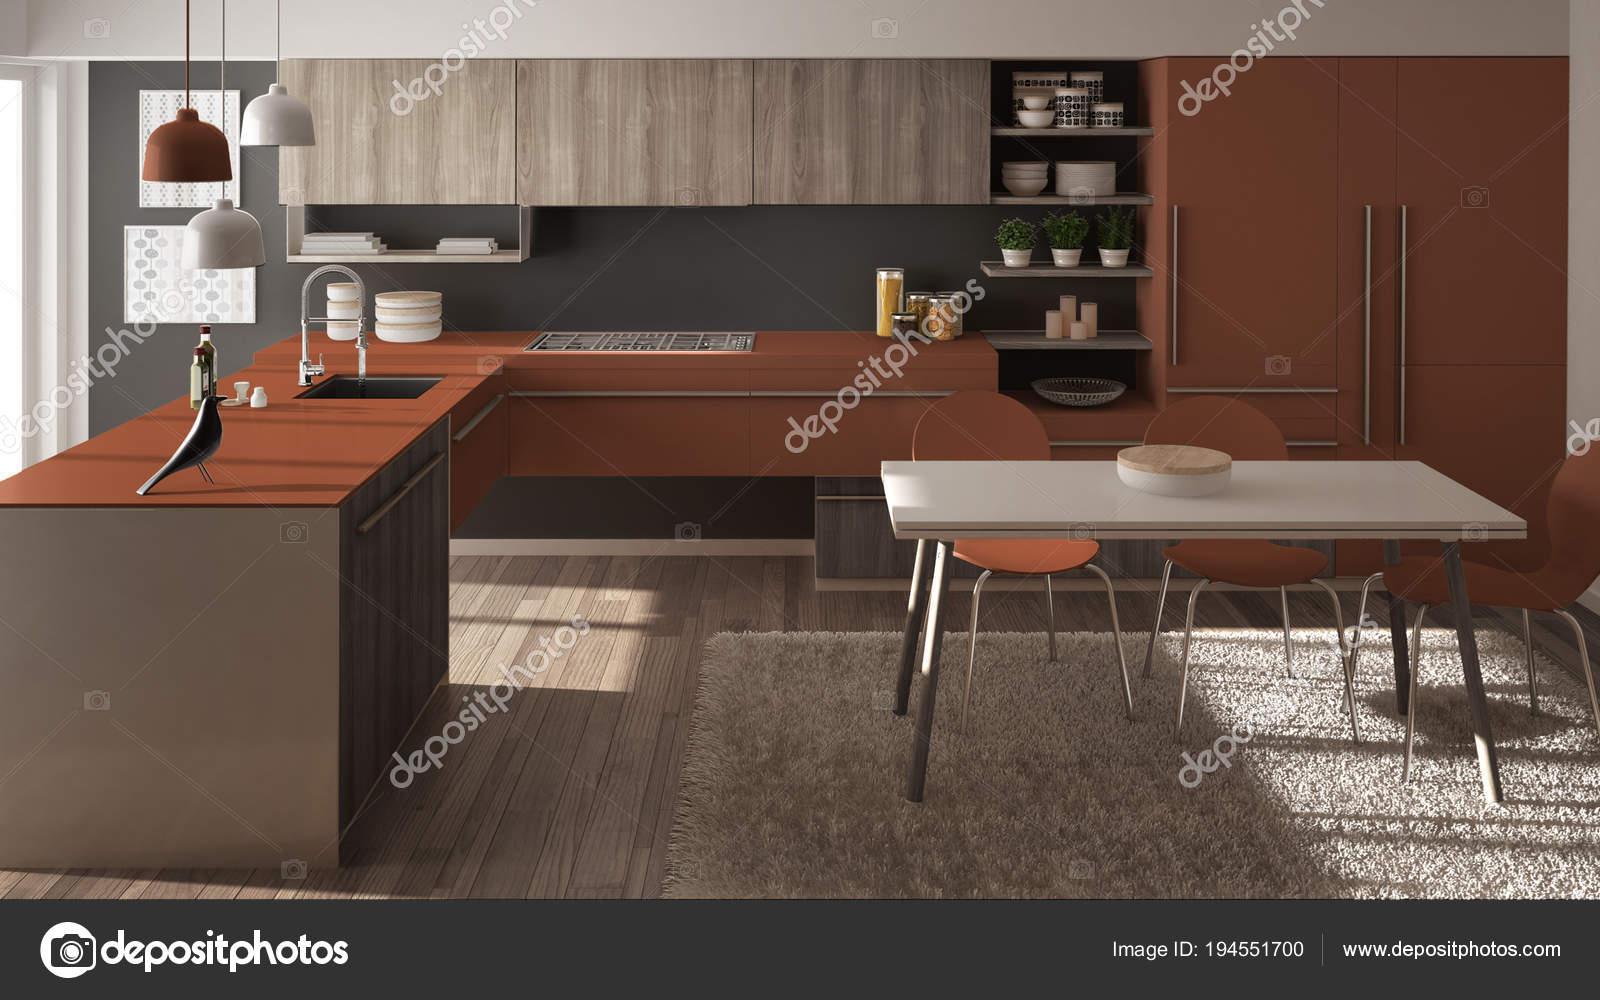 Cuisine en bois minimaliste moderne avec table à manger ...